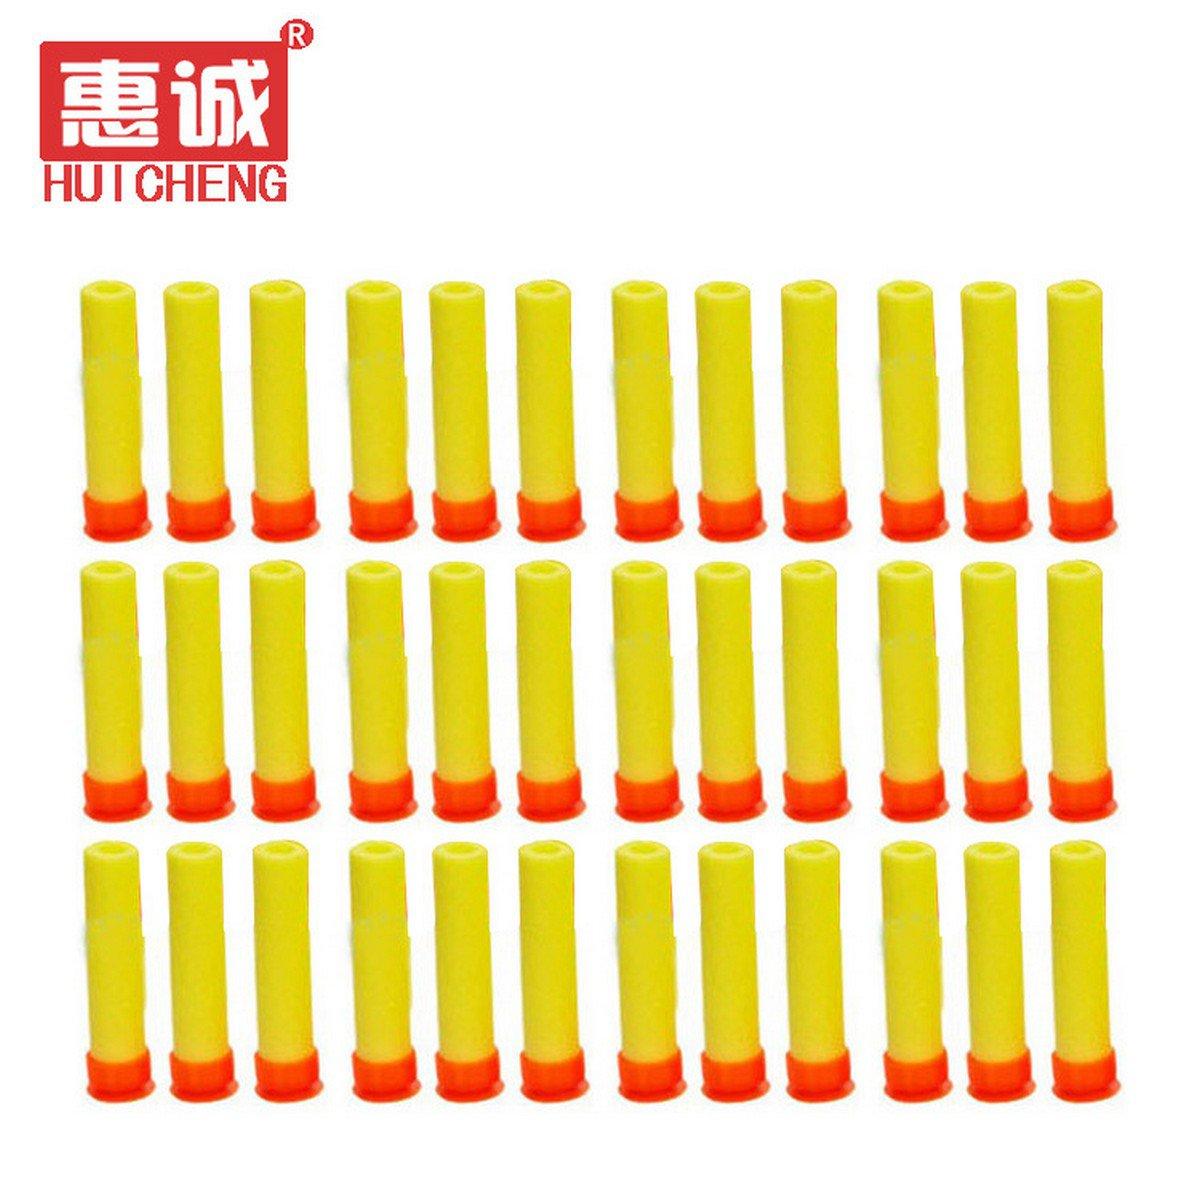 Buy 100pcslot Original Soft Bullets Pistol Part Toys For Toy Gun Shooting Water Gun EVA Bullet Safe